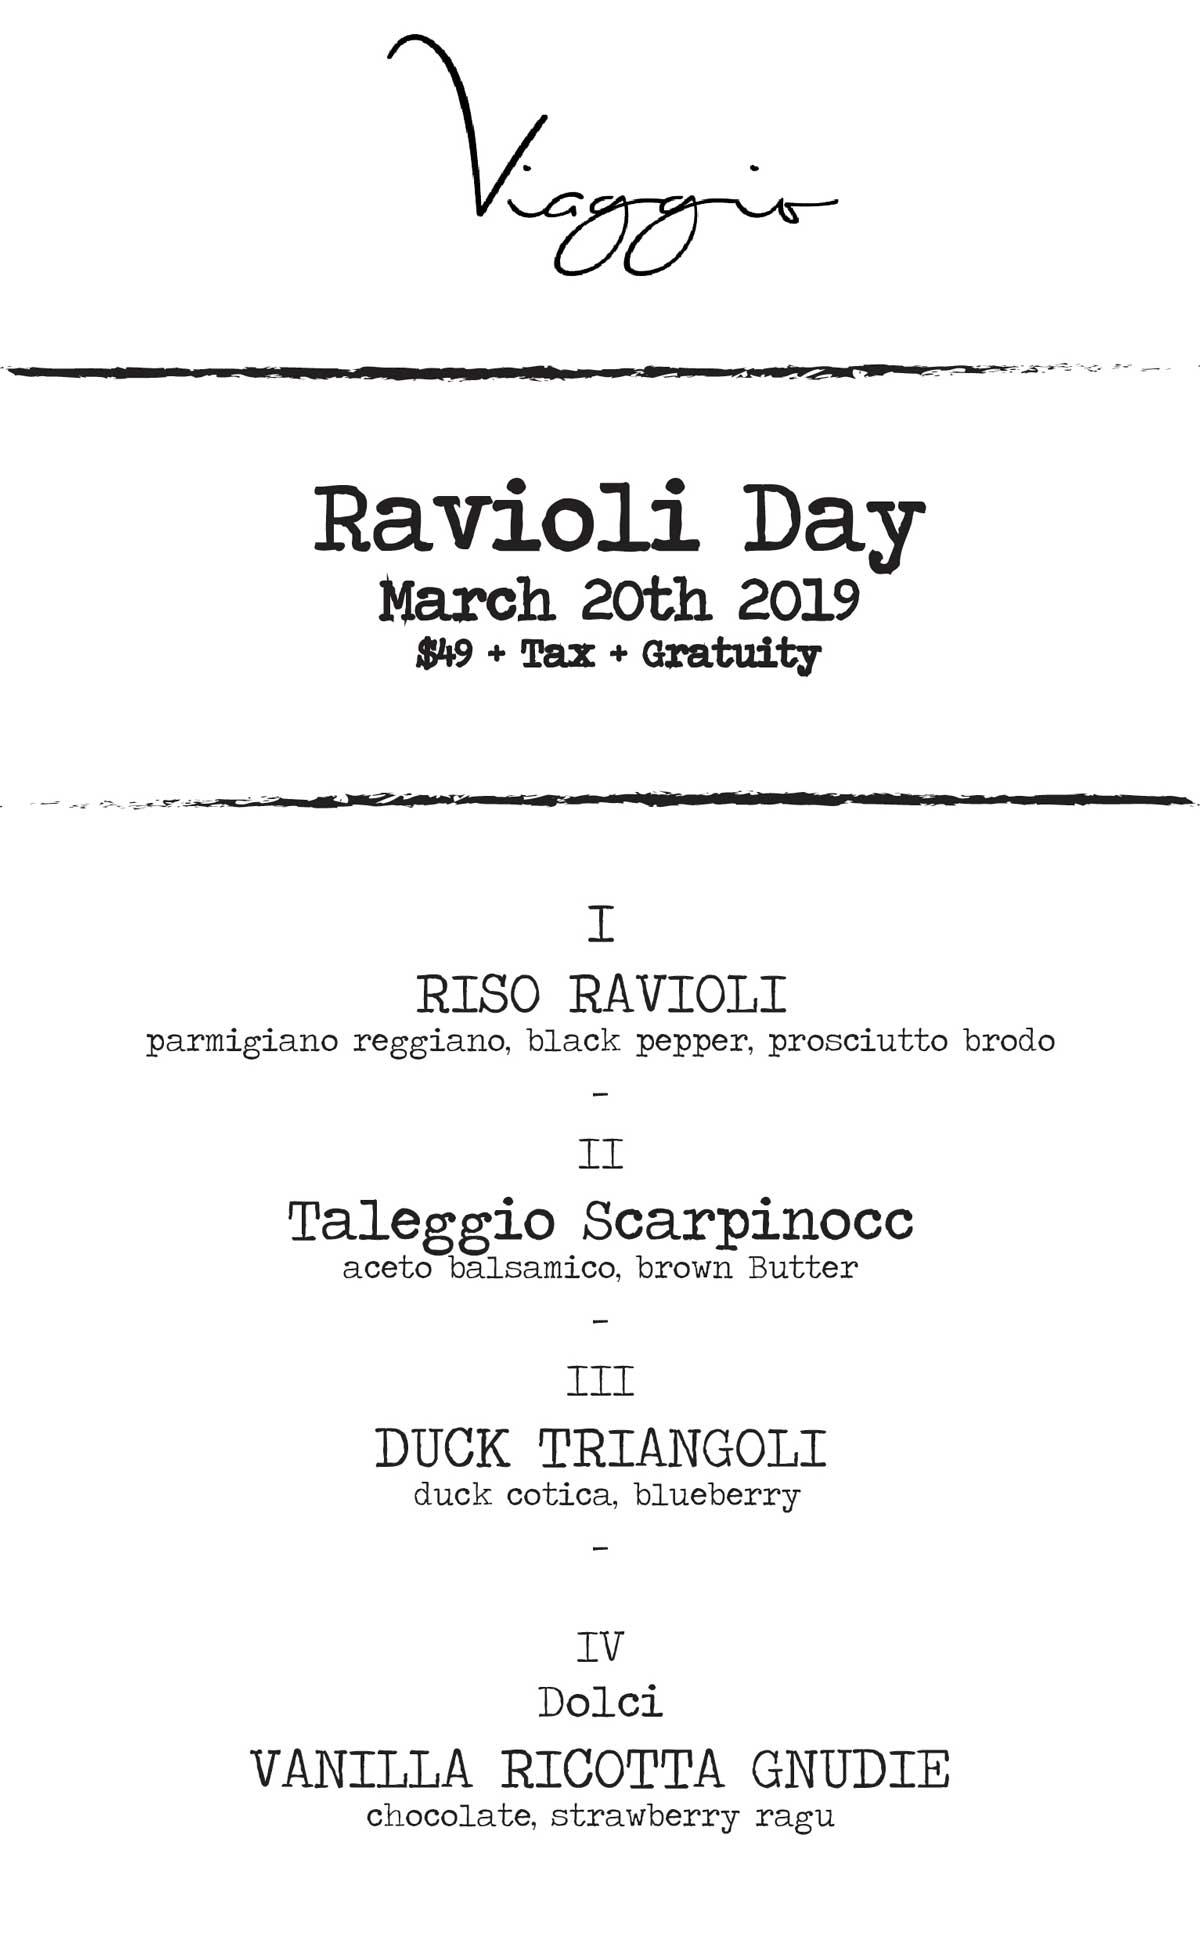 ravioli day menu 2019